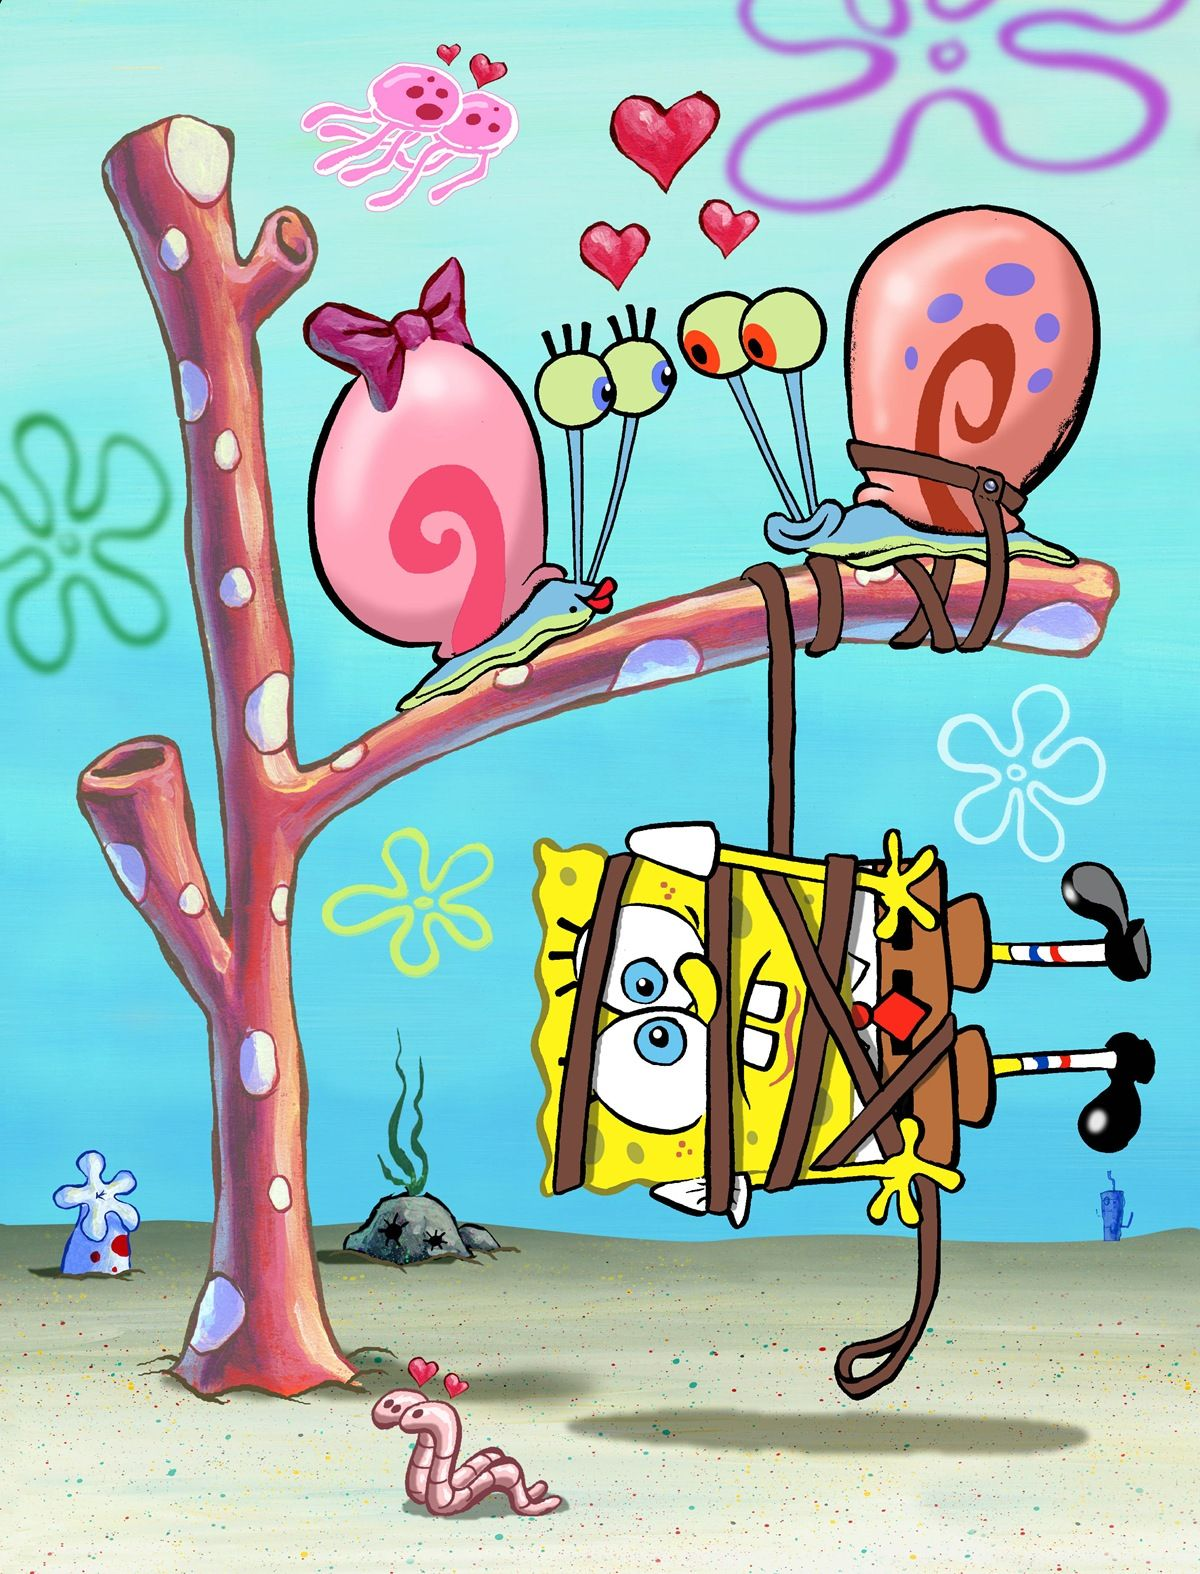 Gary Spongebob SpongeBob Gary the Snail and Snelly Village Voice